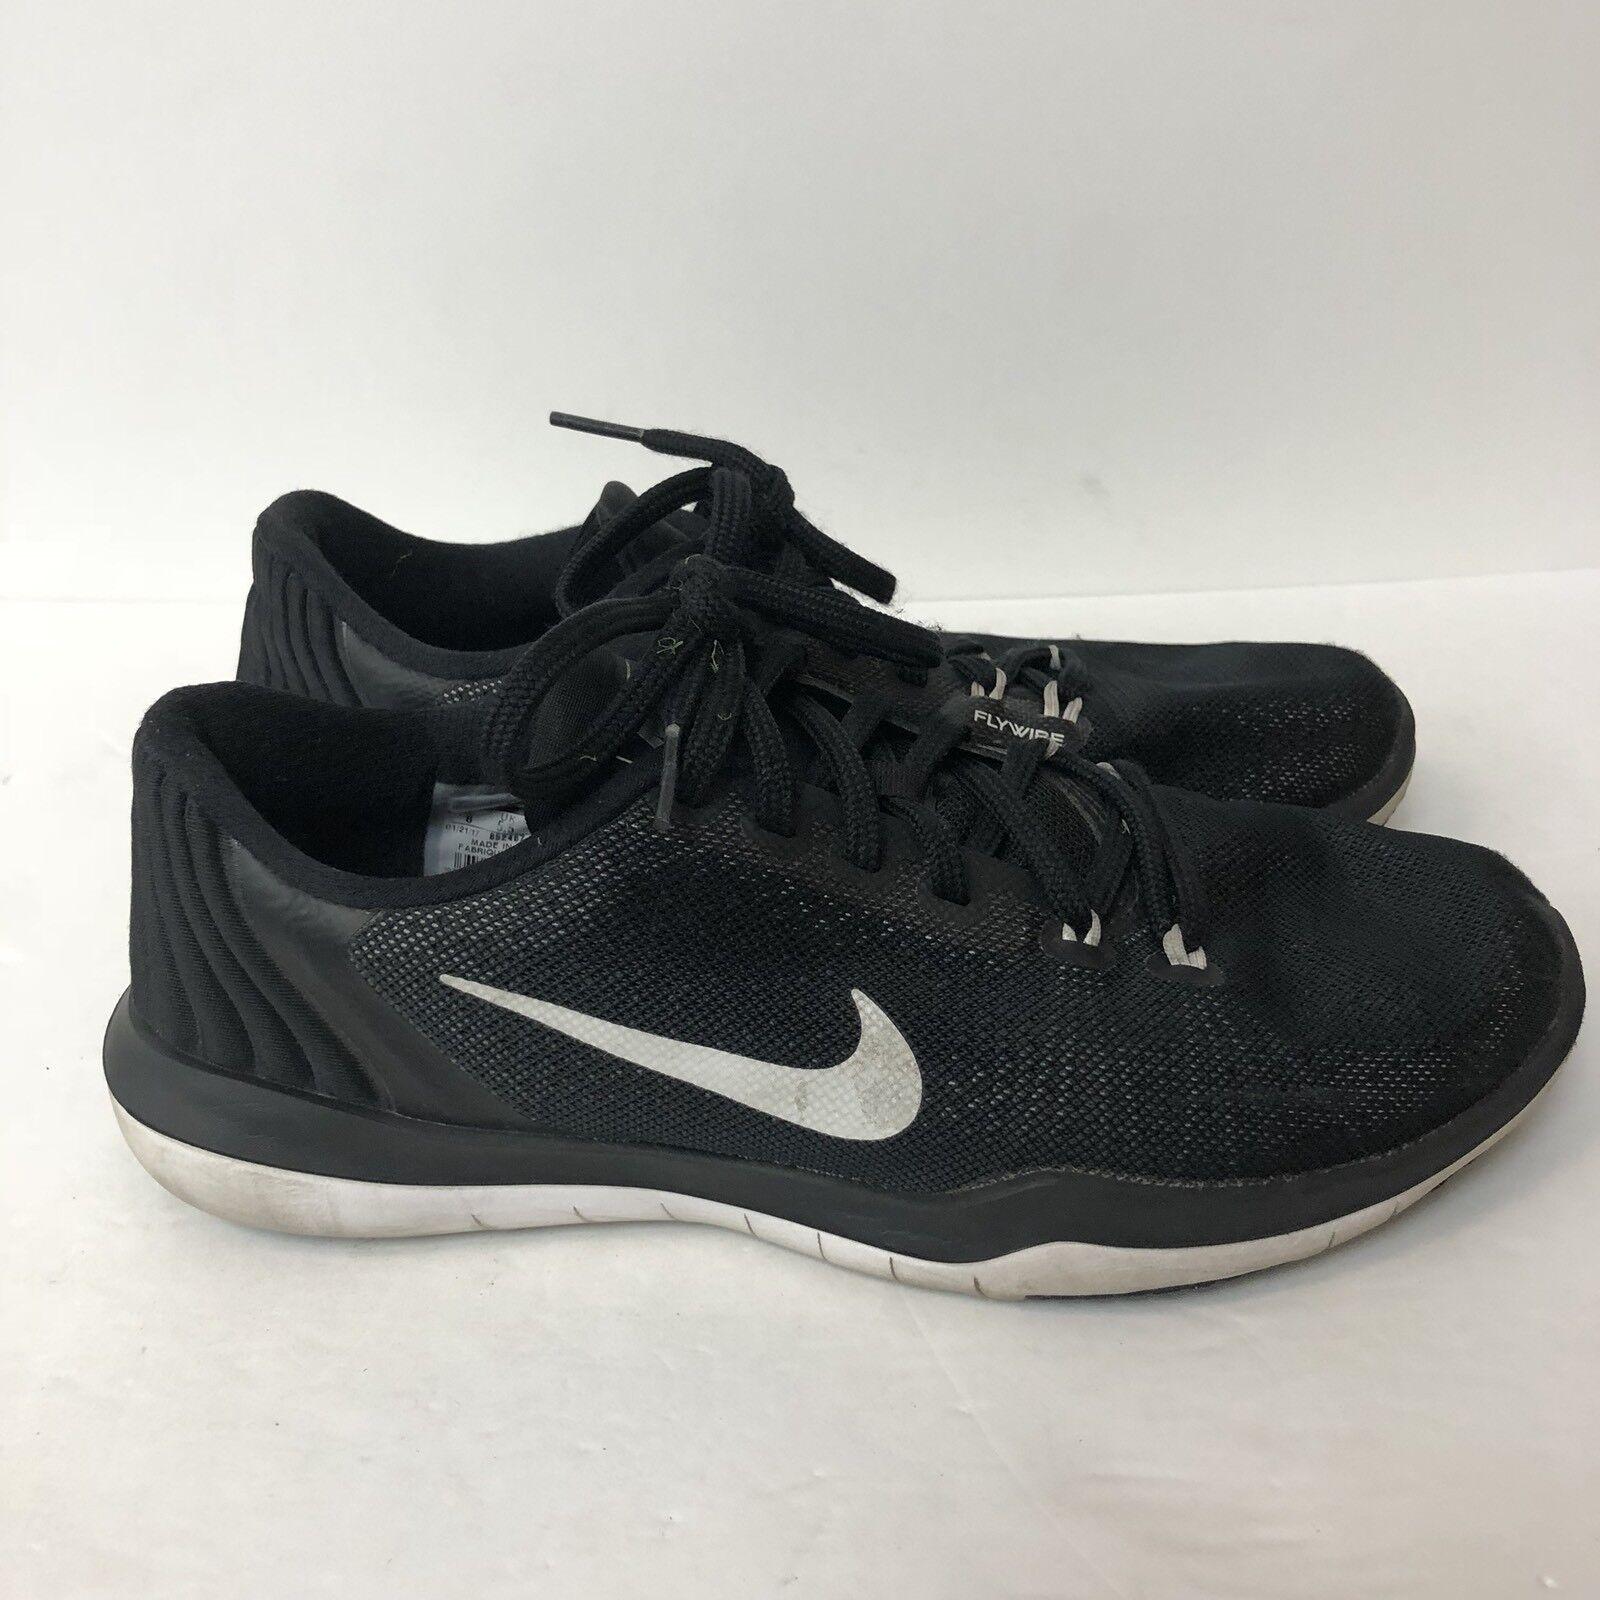 Nike Flex Shoes Supreme Tr 5 Running Shoes Flex Sneakers Women Size 8 7e6293